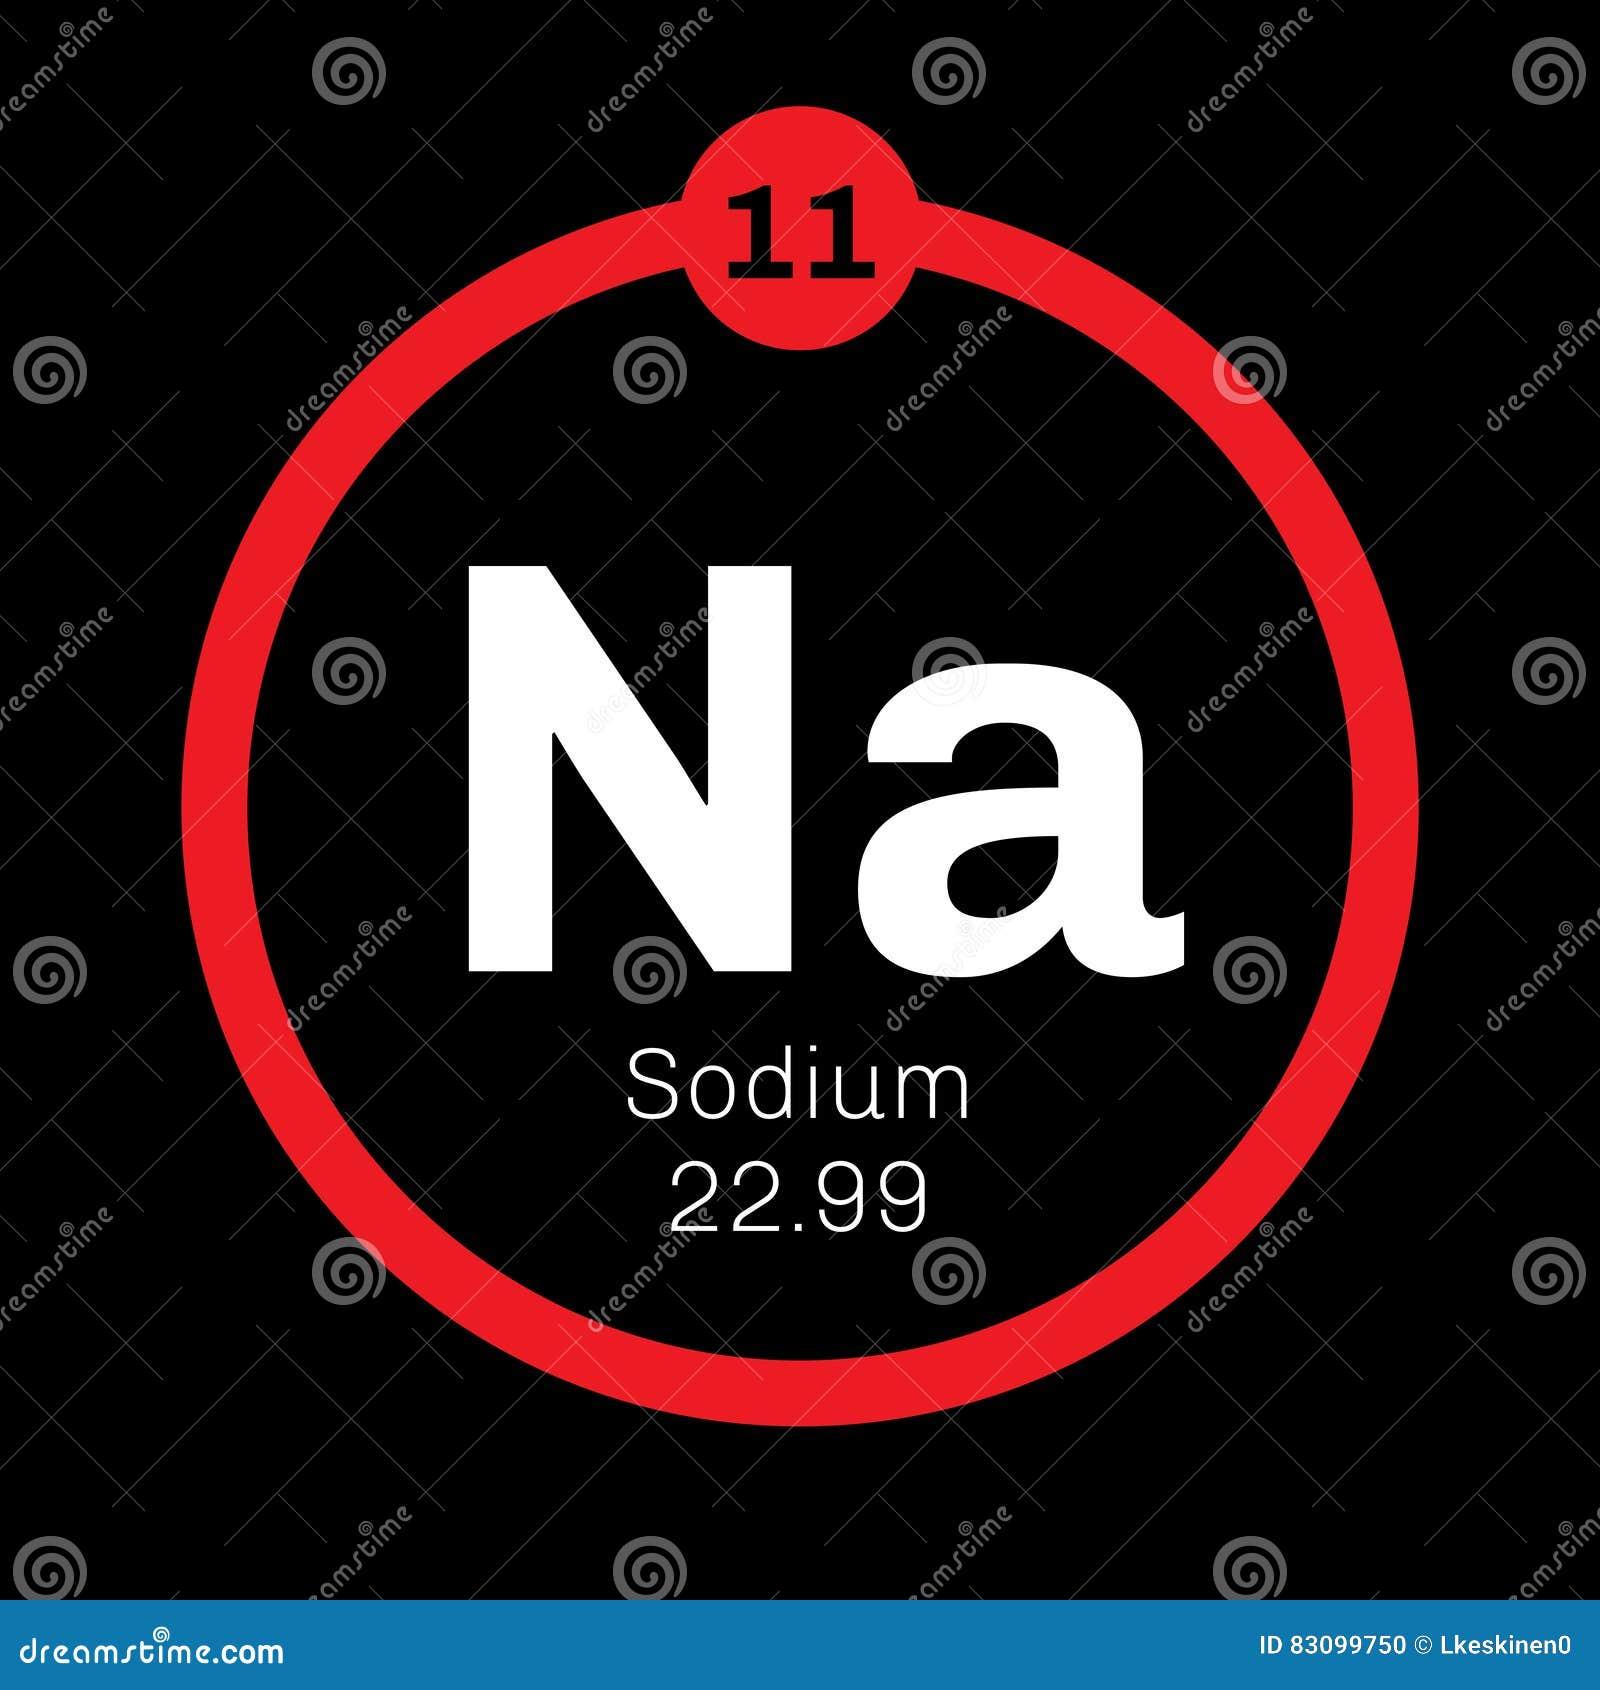 Sodium chemical element stock vector illustration of configuration sodium chemical element configuration sign urtaz Gallery